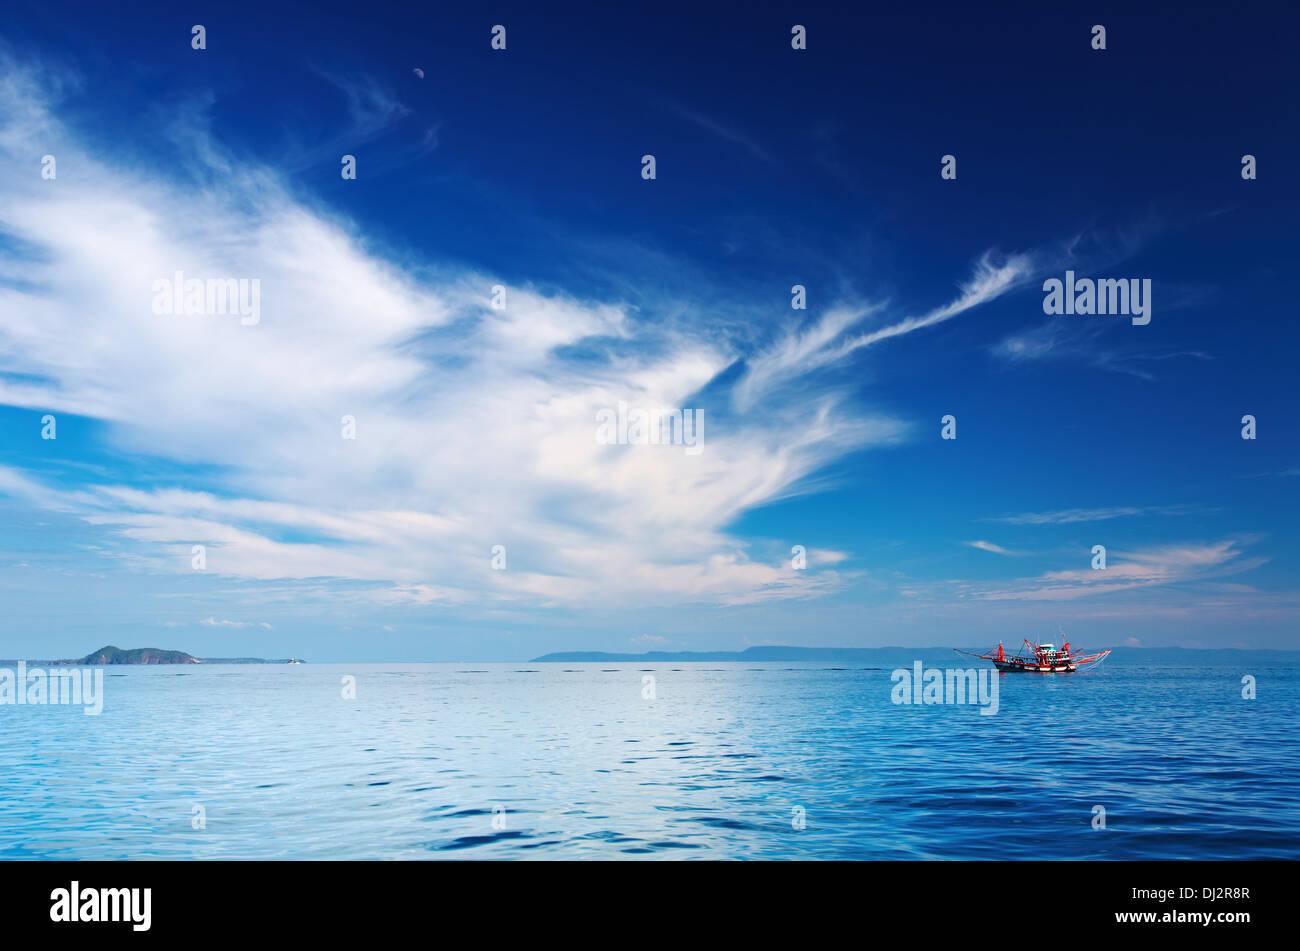 Seascape avec bateau de pêche, l'archipel de Trat, Thaïlande Banque D'Images